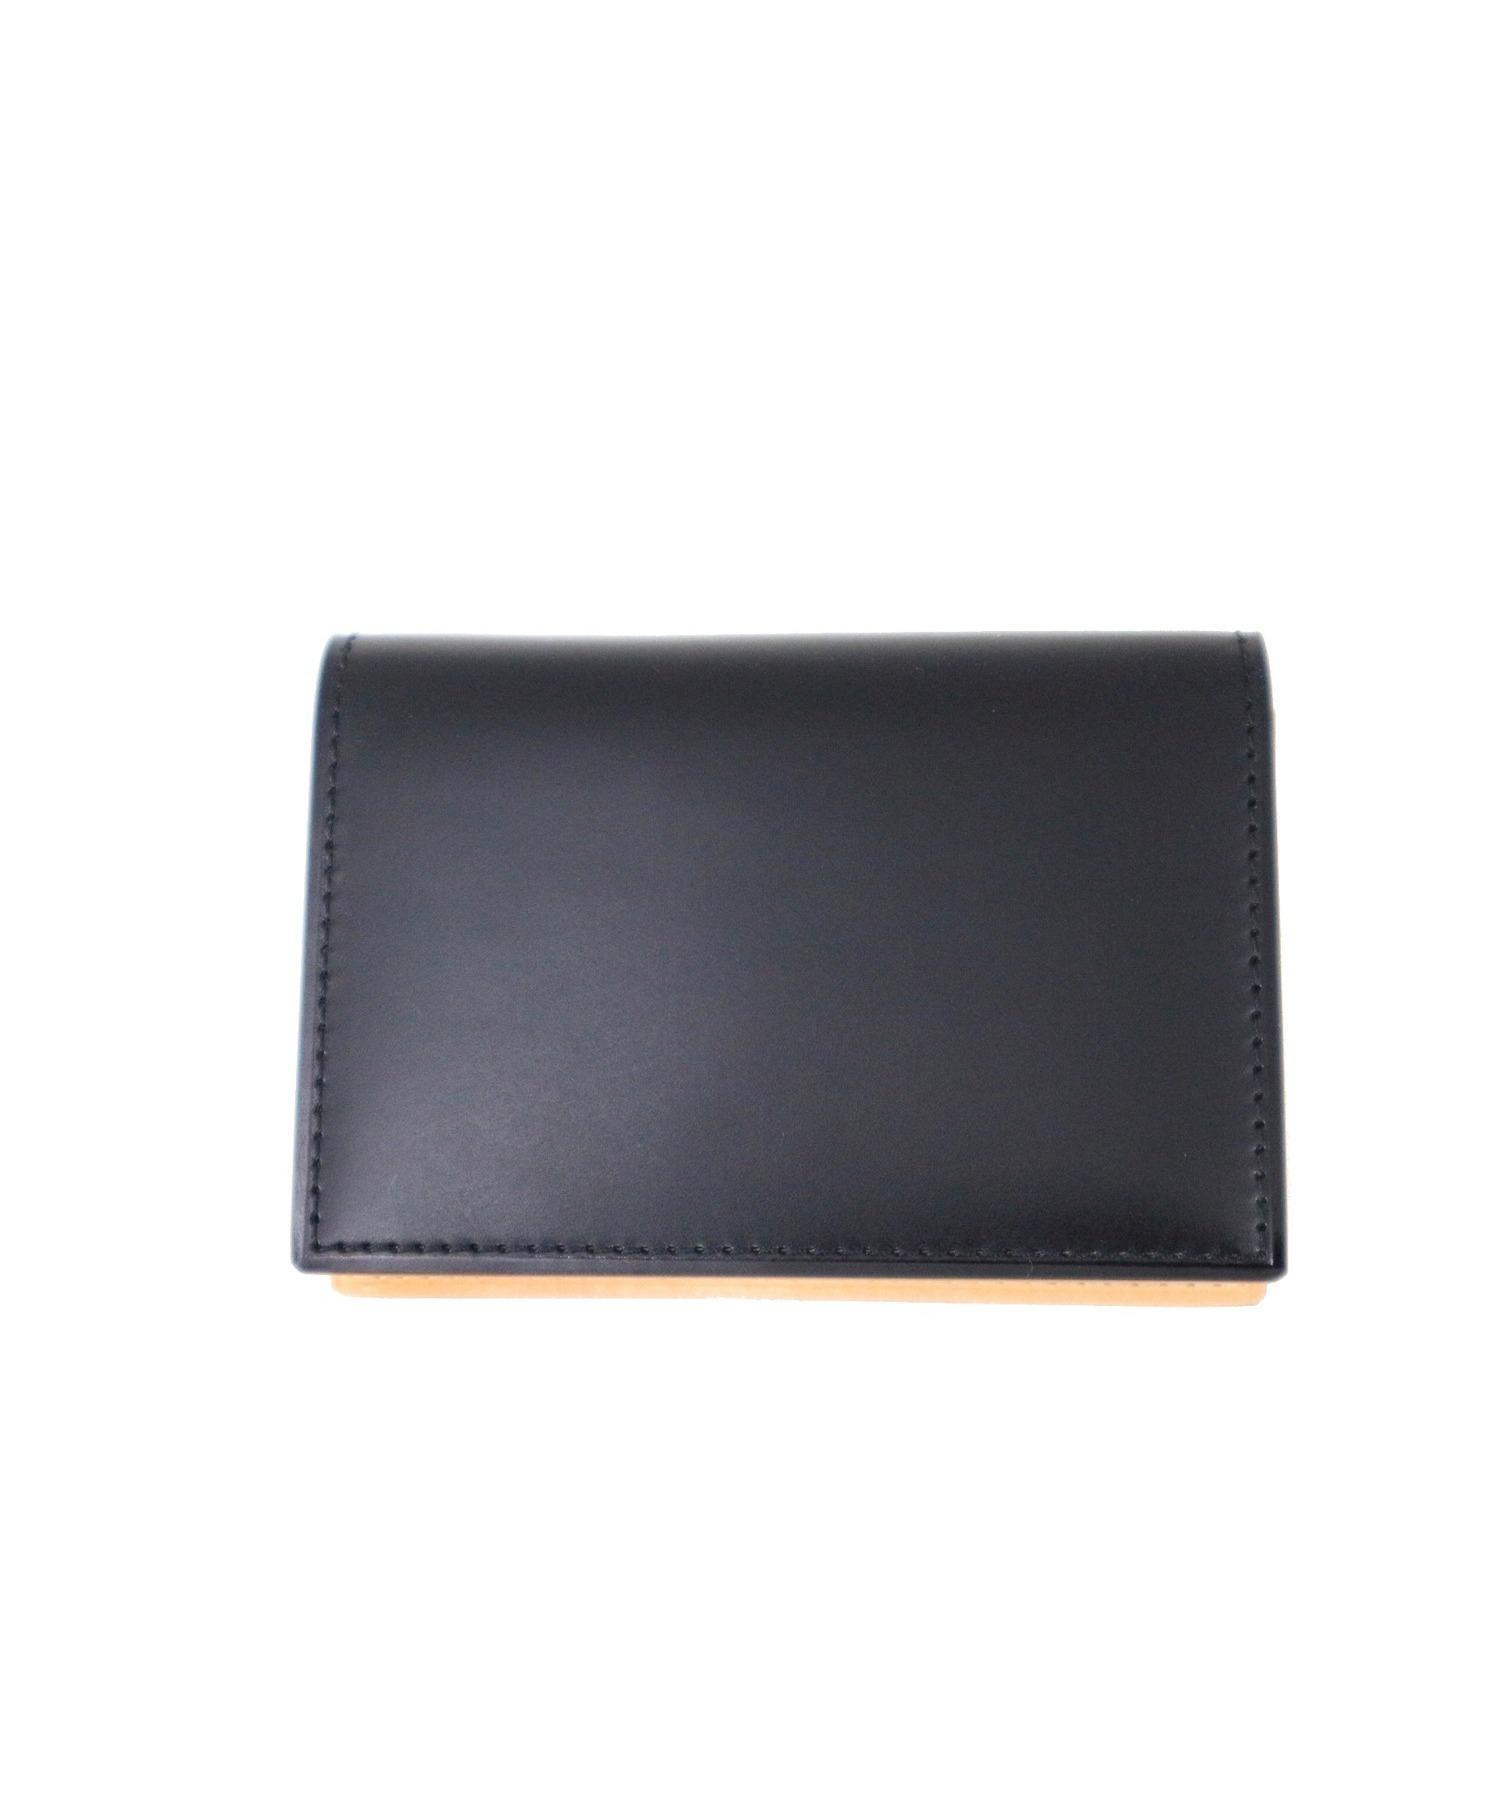 26a87e9016a0 中古・古着通販】GANZO (ガンゾ) カードケース ブラック 参考価格23.760 ...